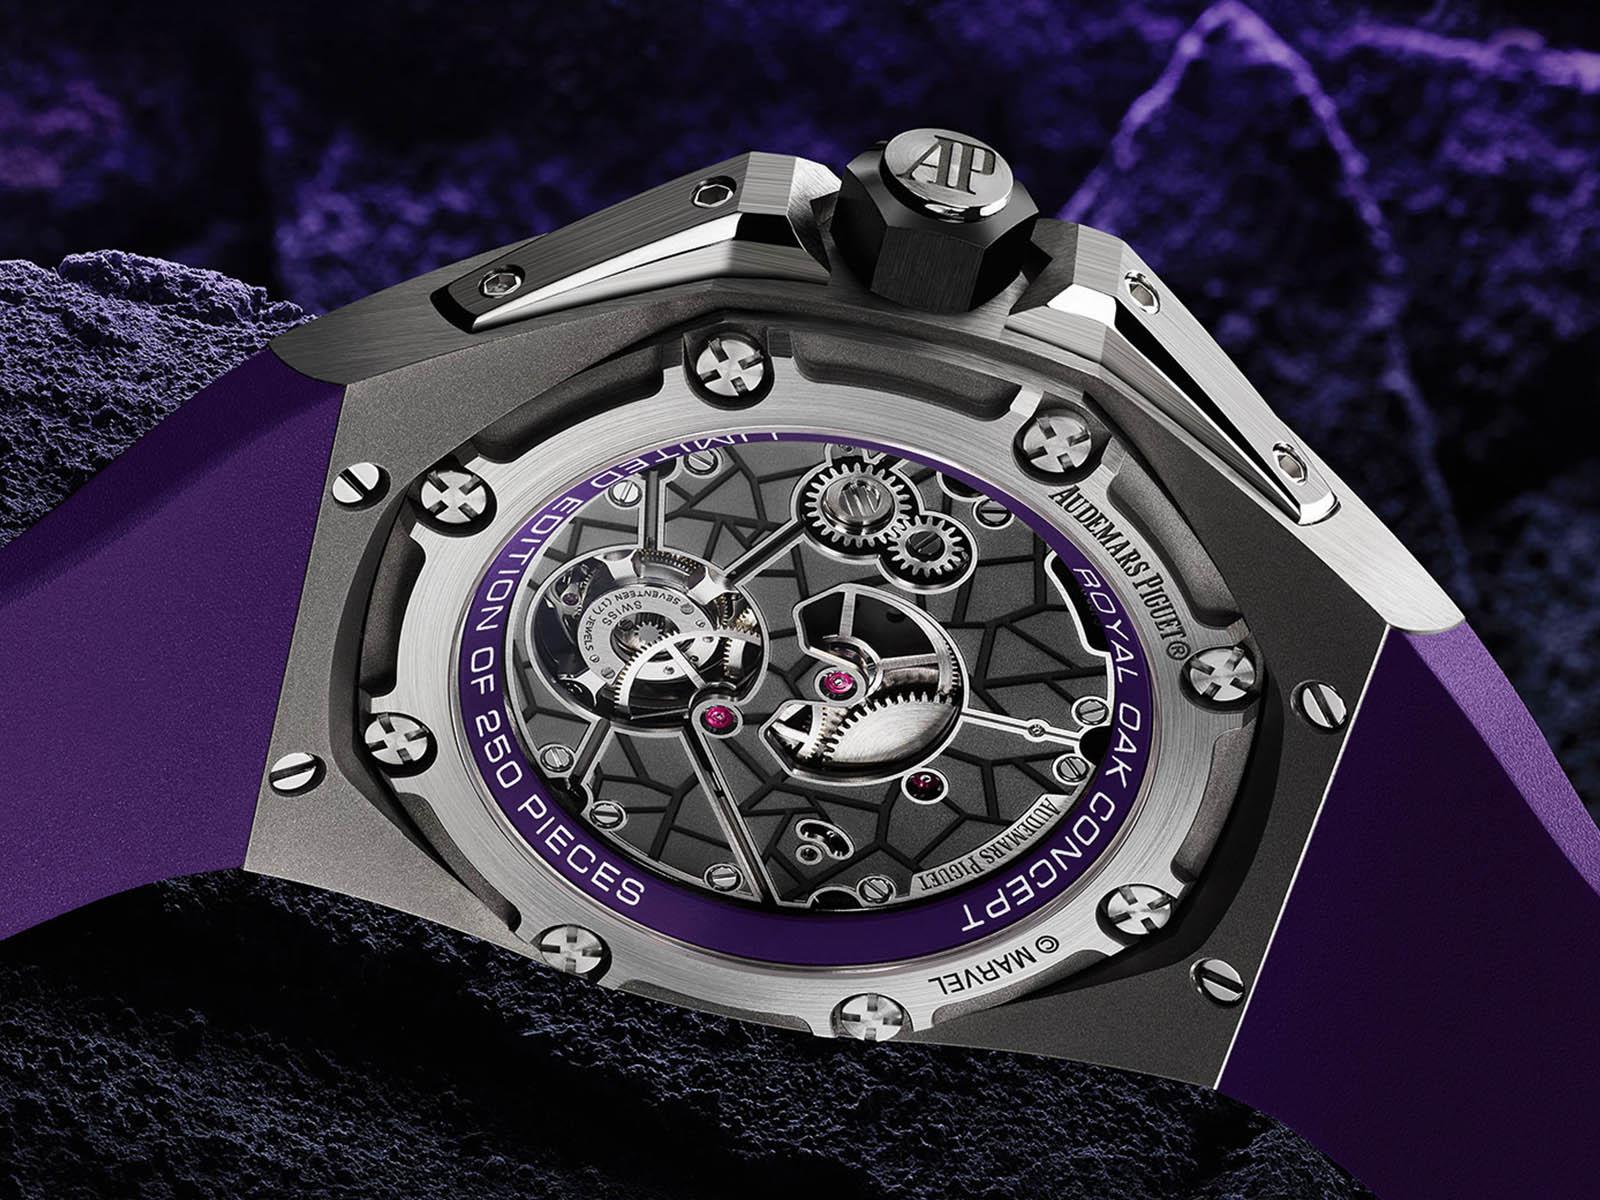 26620io-oo-d077ca-01-audemars-piguet-marvel-royal-oak-concept-black-panther-7.jpg